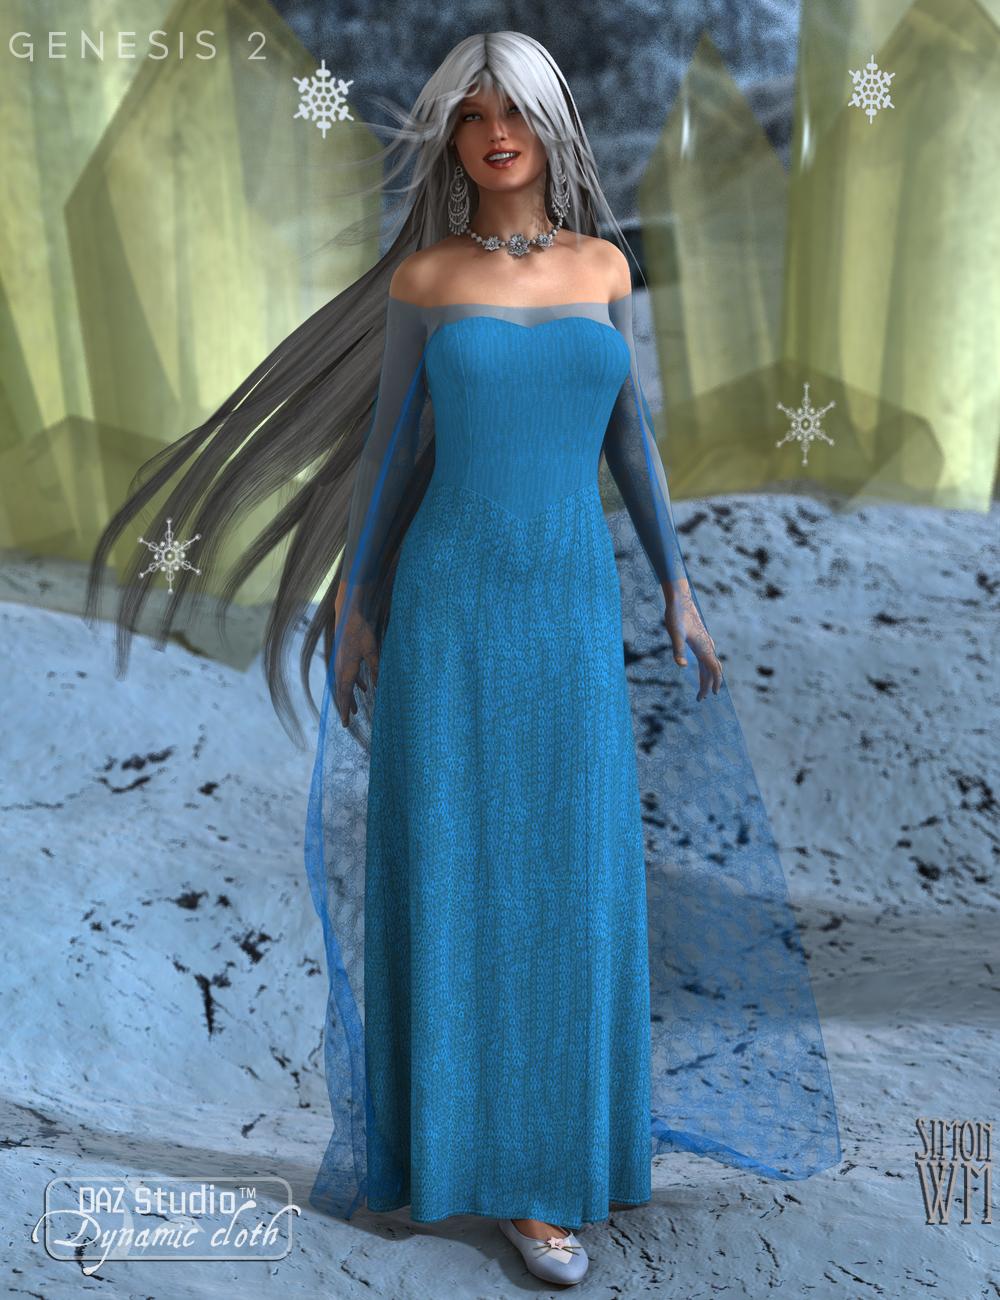 Fairy Queen: Dynamic Royal Dress by: SimonWMOptiTex, 3D Models by Daz 3D